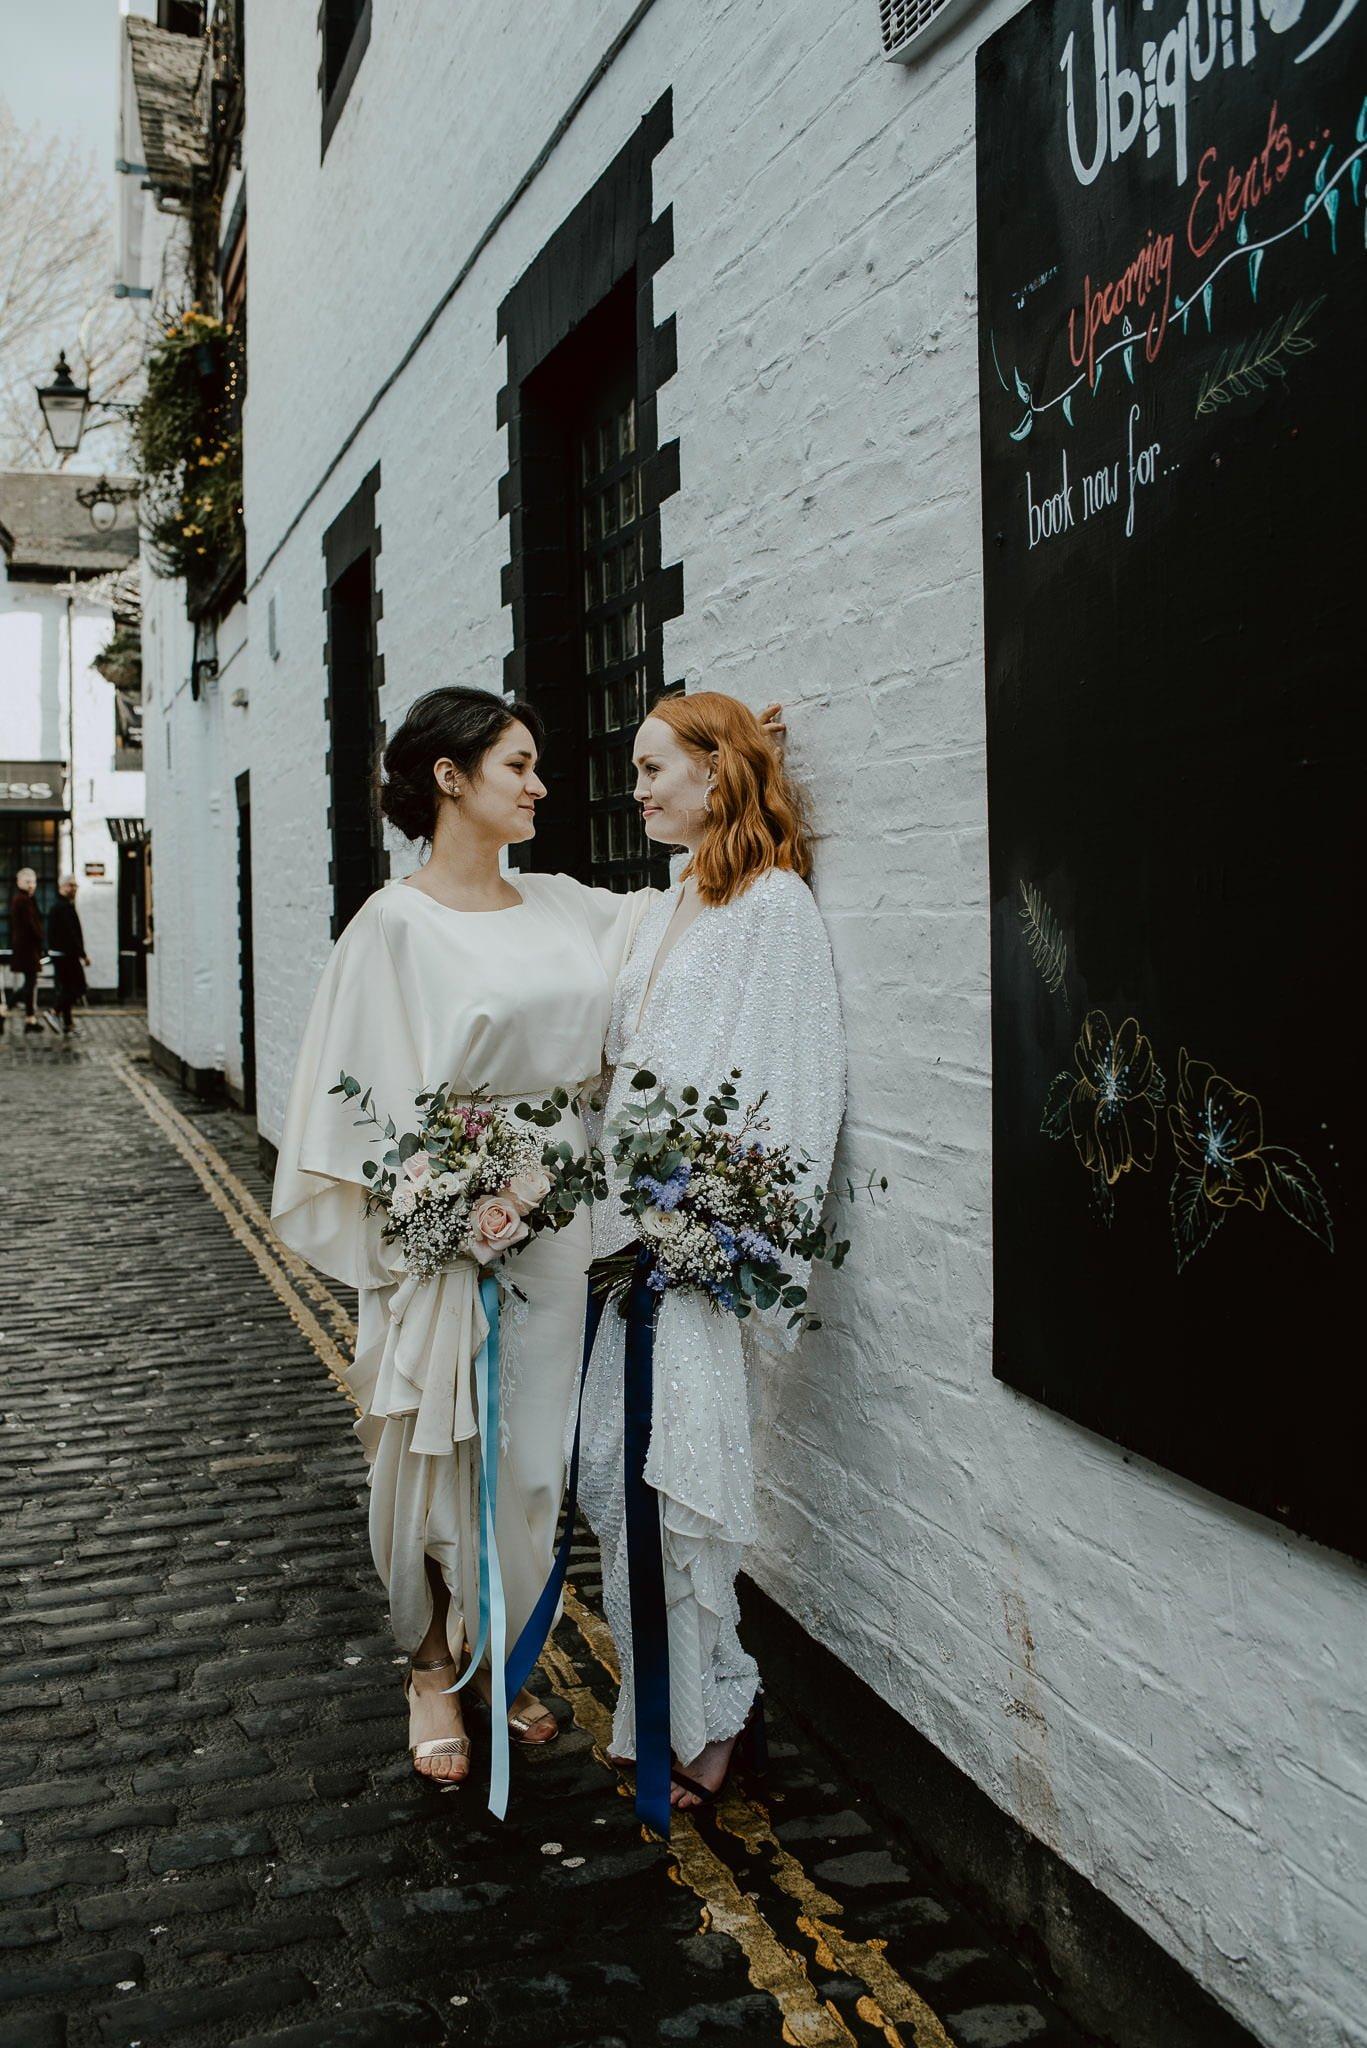 A Dreamy Pre-Raphaelite Wedding at the Bothy in Glasgow 36